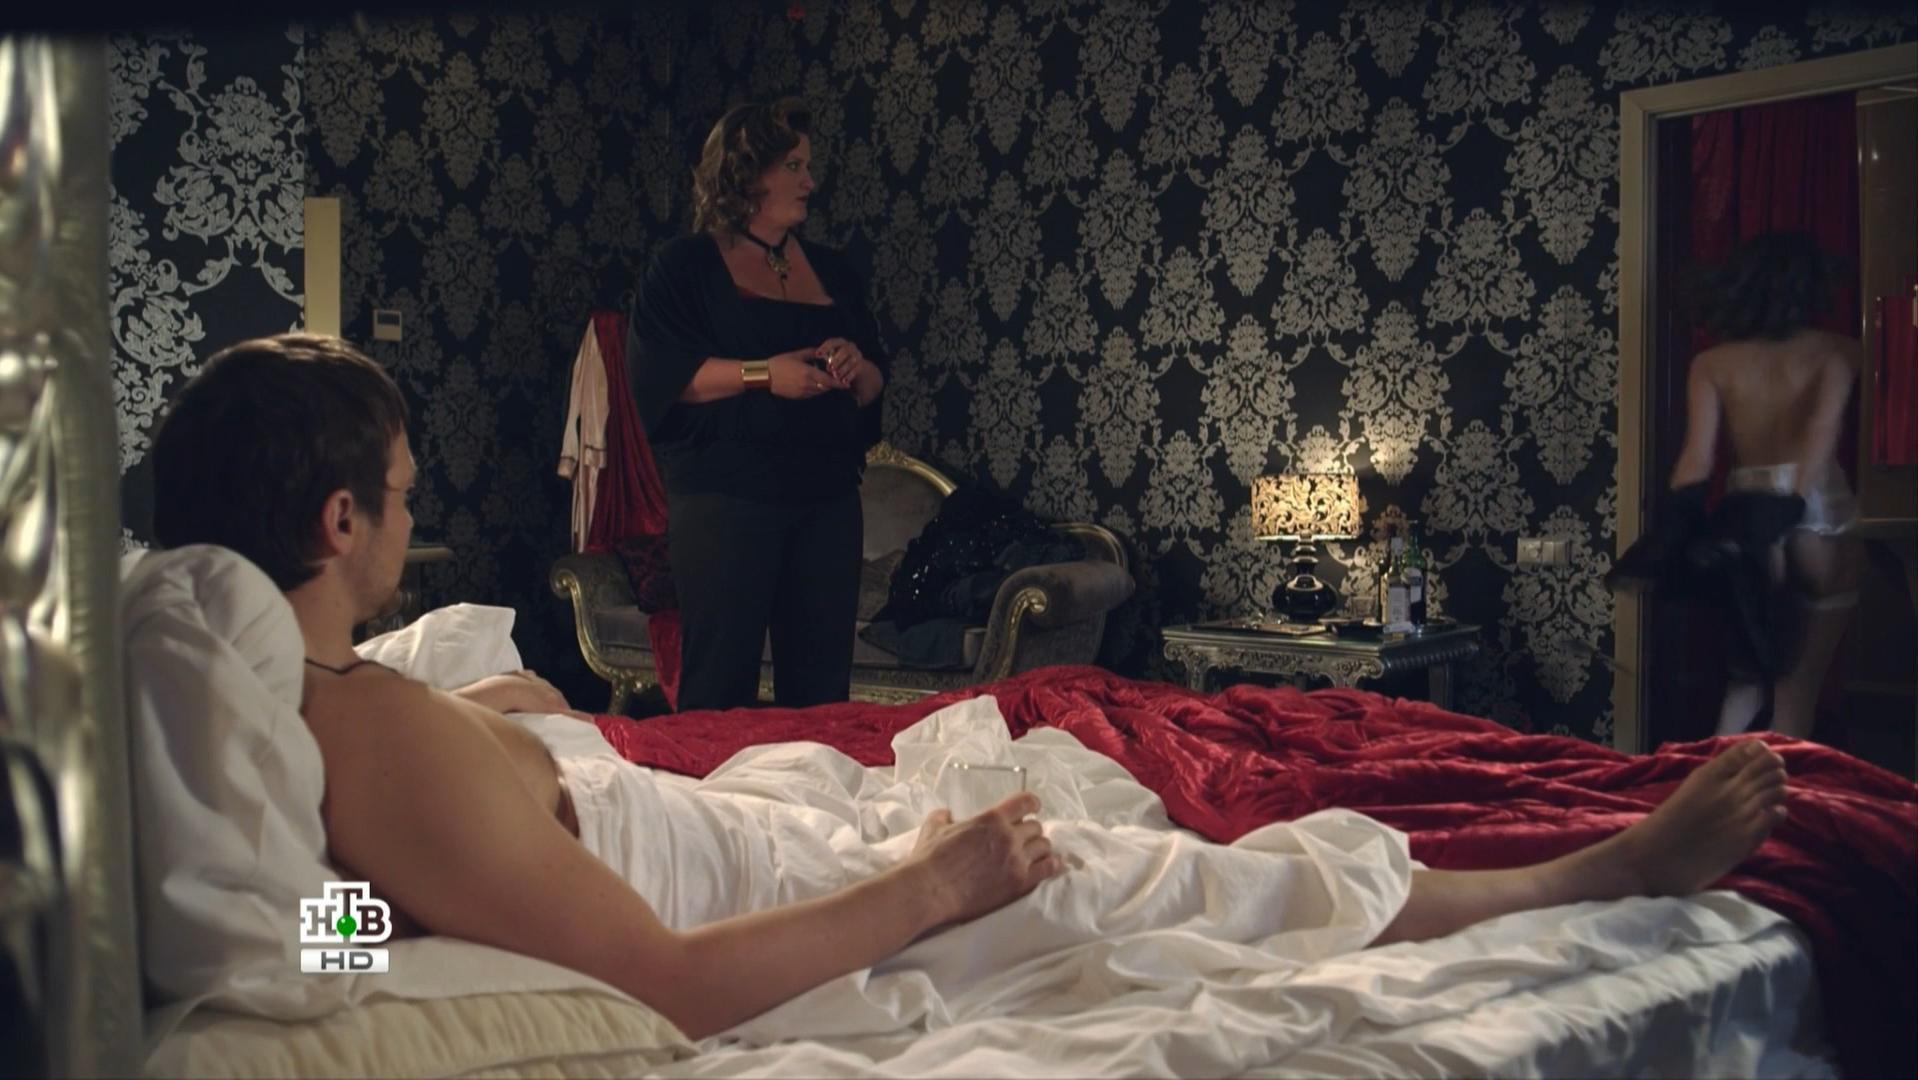 Yuliya Latyisheva nude - Delo Chesti s01e02 (2013)